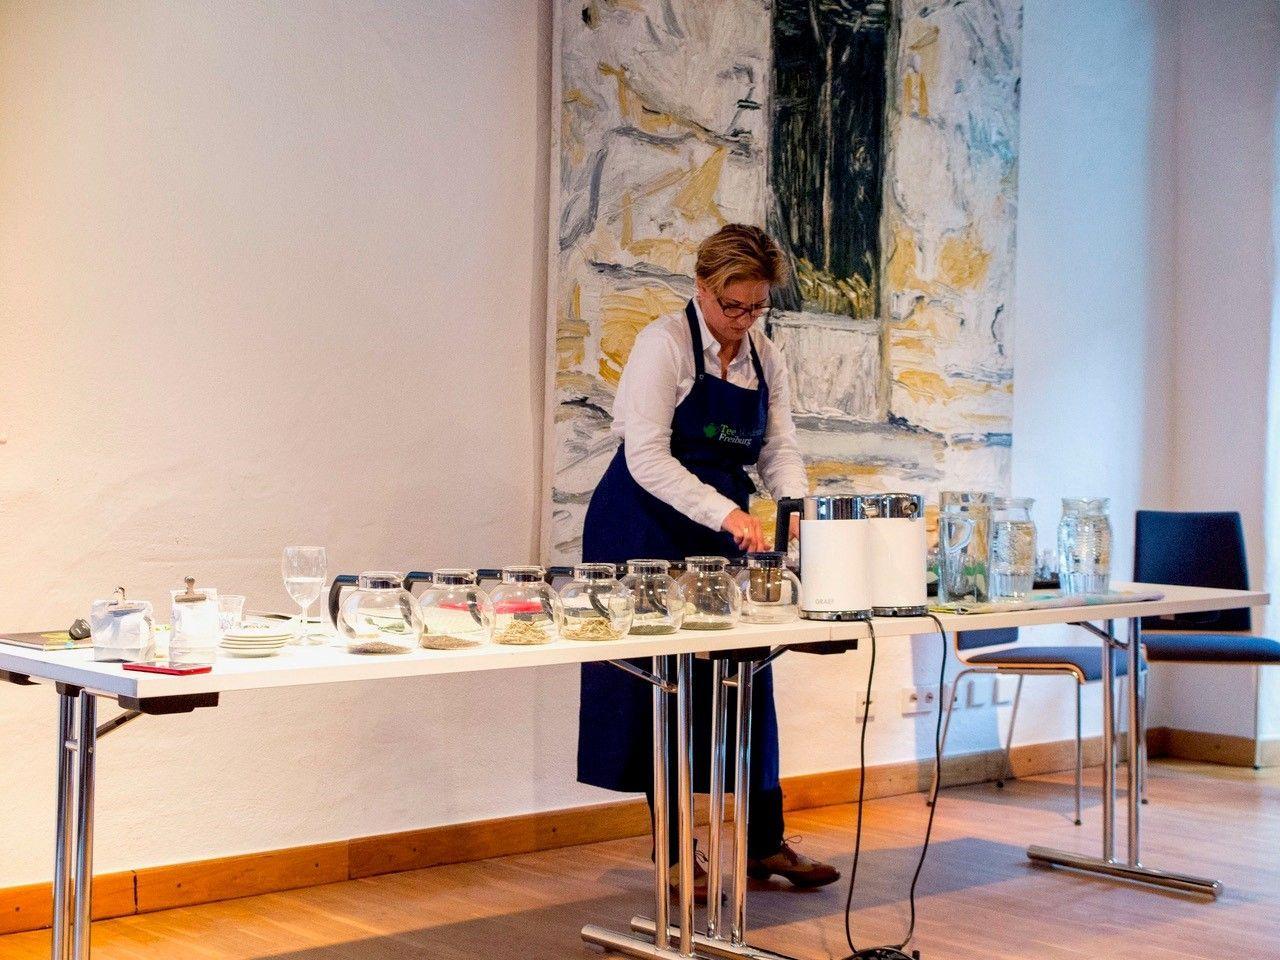 Teeseminar Teeakademie Freiburg